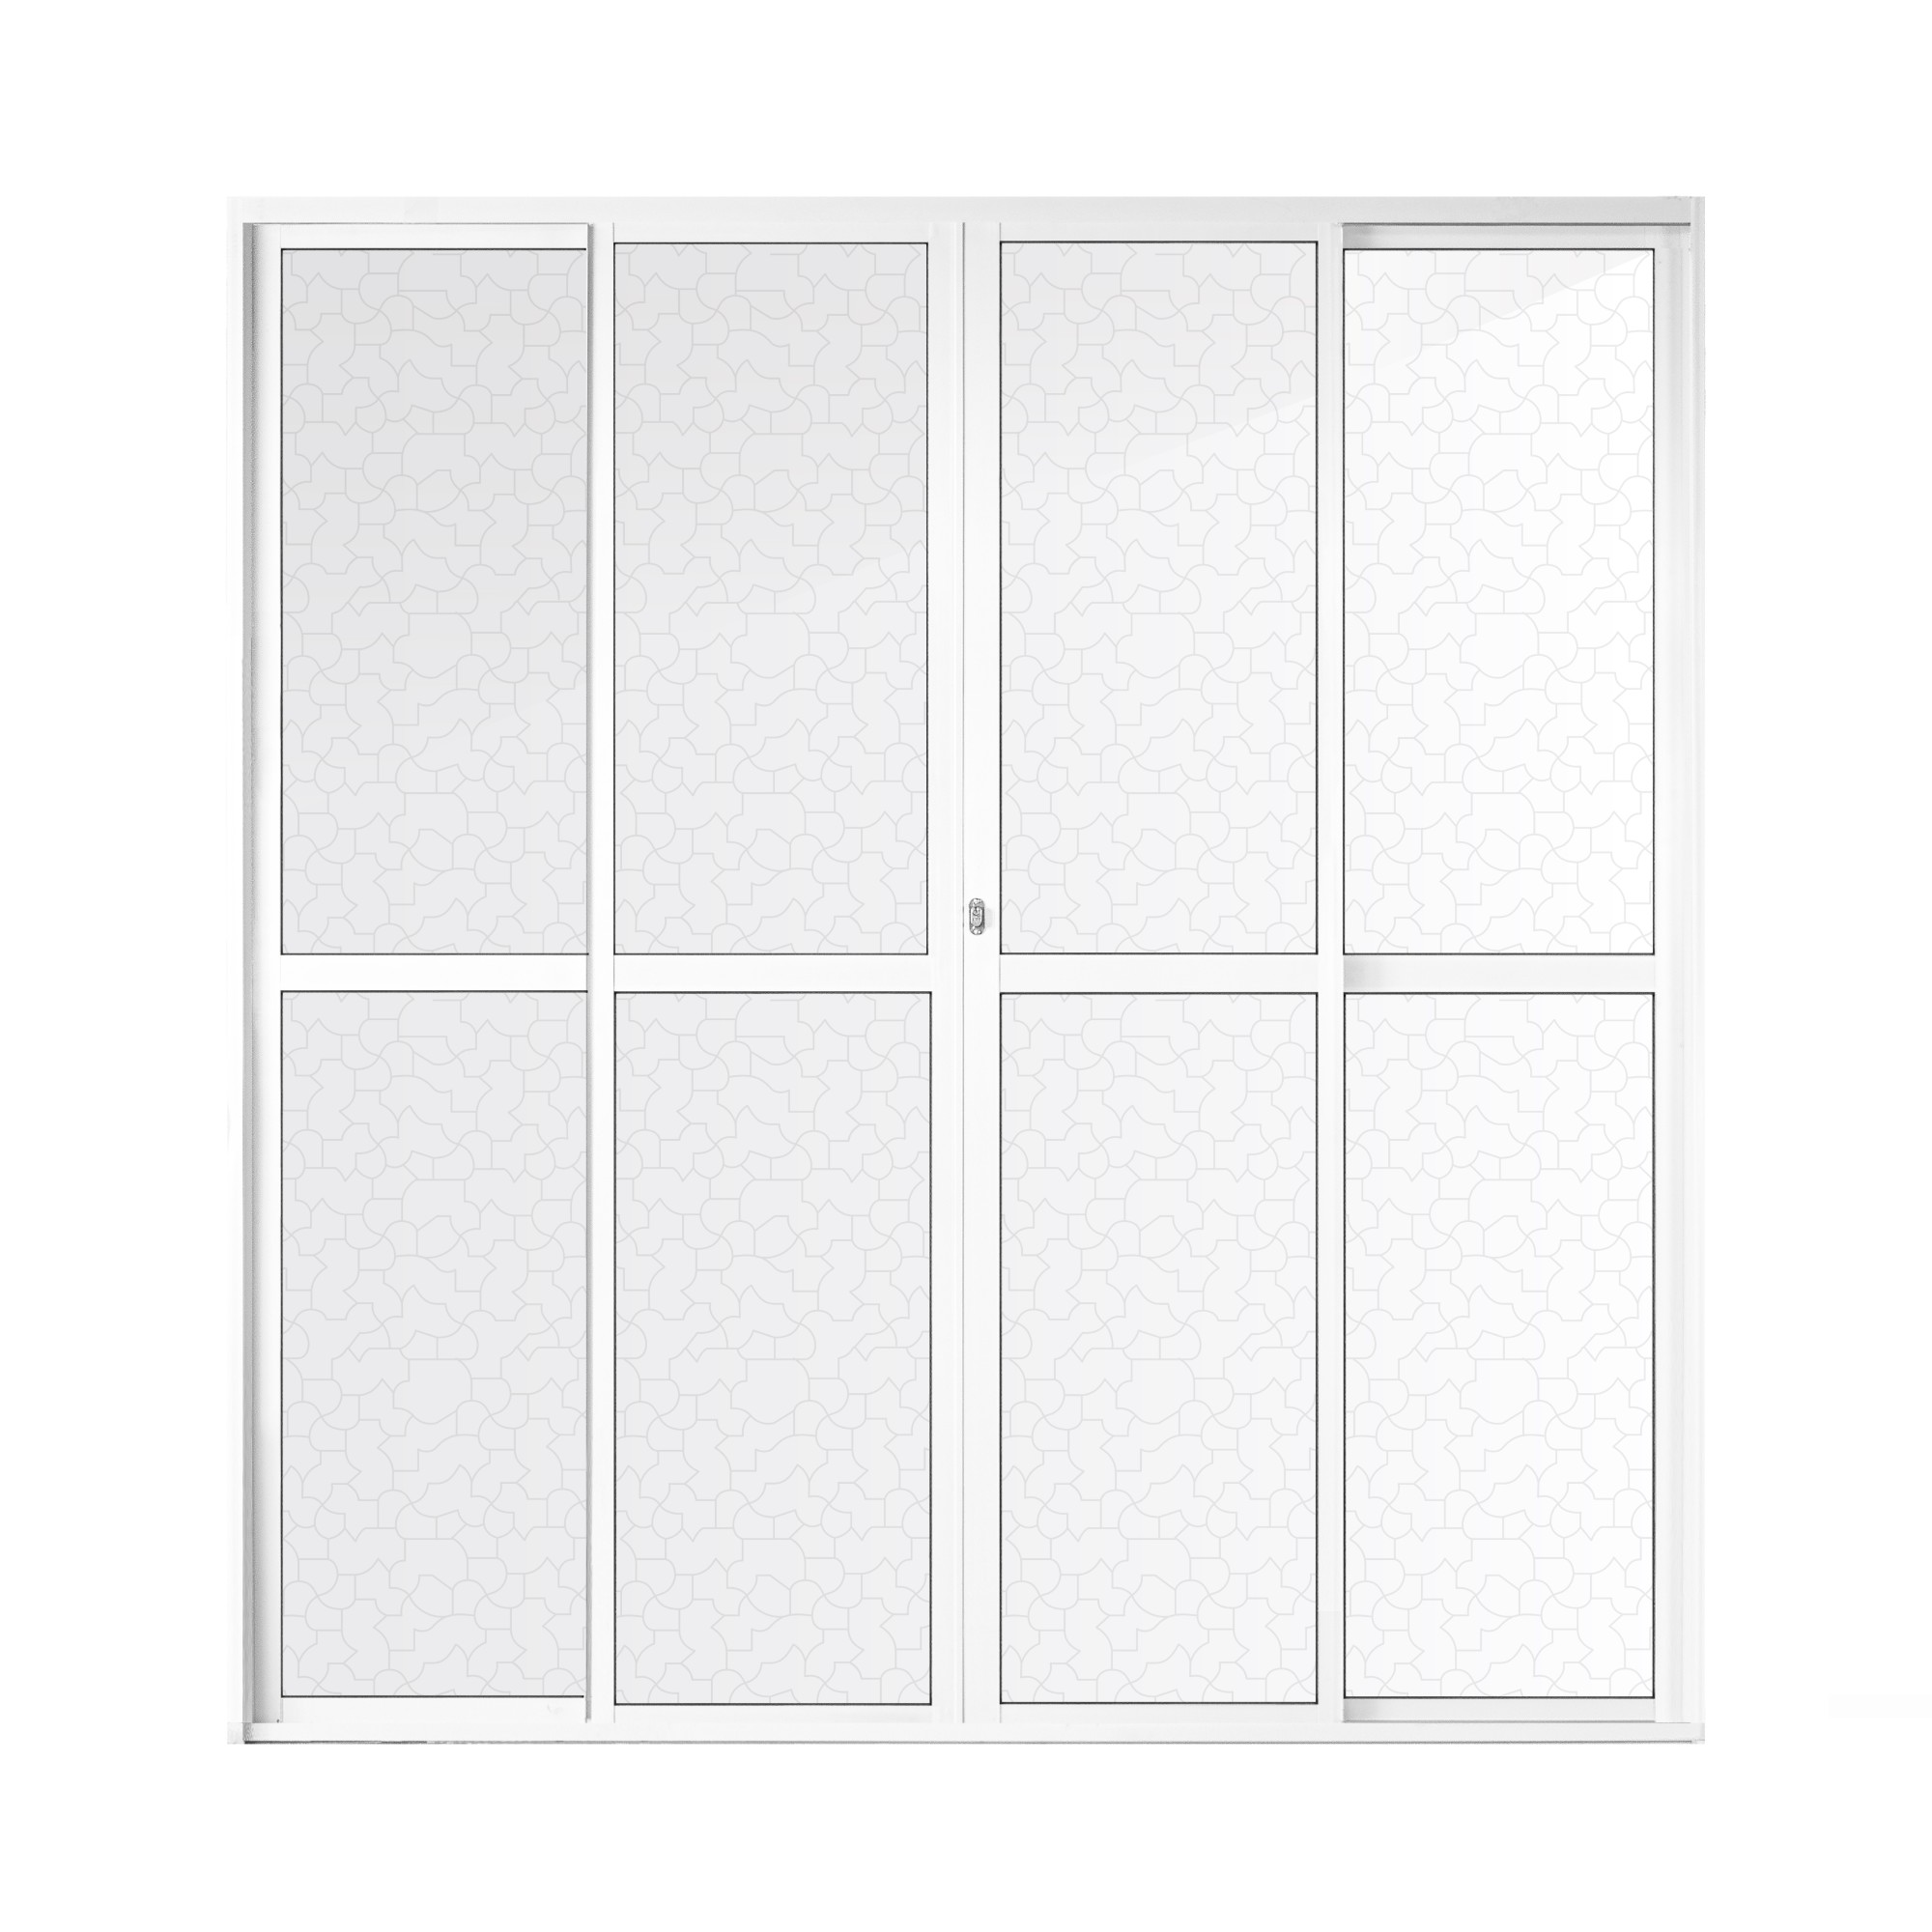 Porta Balcao de Aluminio Super Pop 4 Folhas 210x200 cm Branco - Aluvid